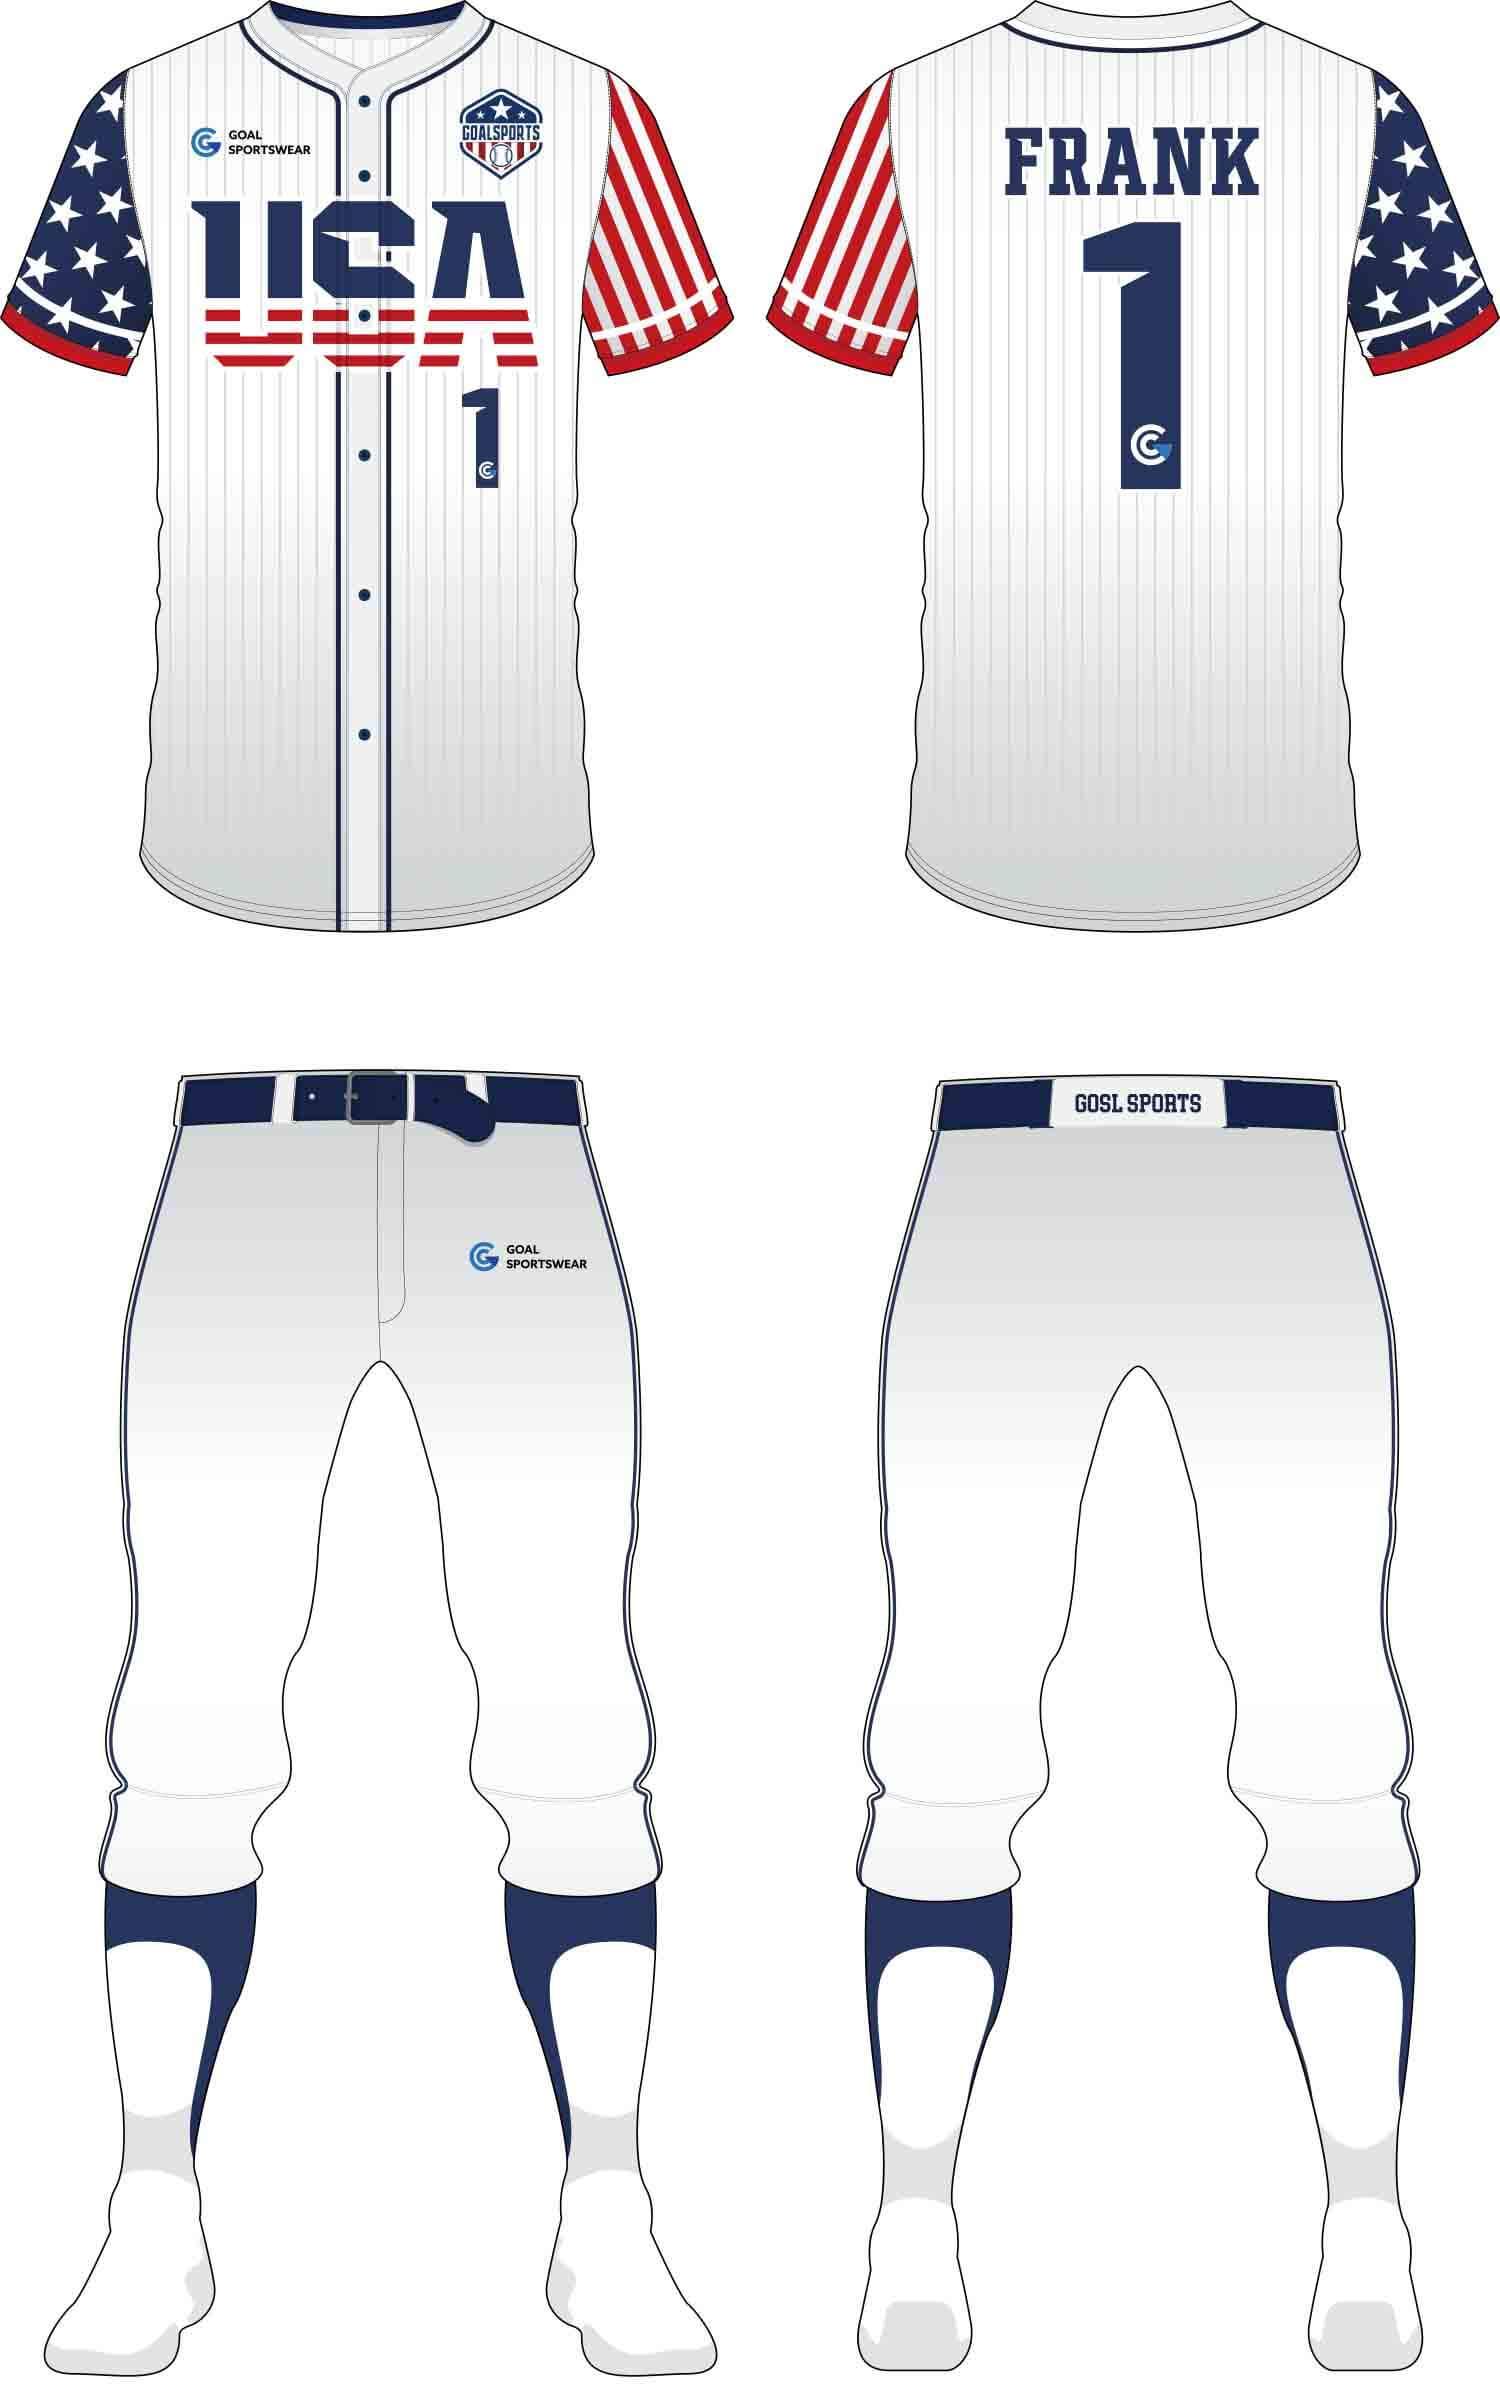 Full polyester breathable custom design sublimated Custom Youth Softball Uniforms